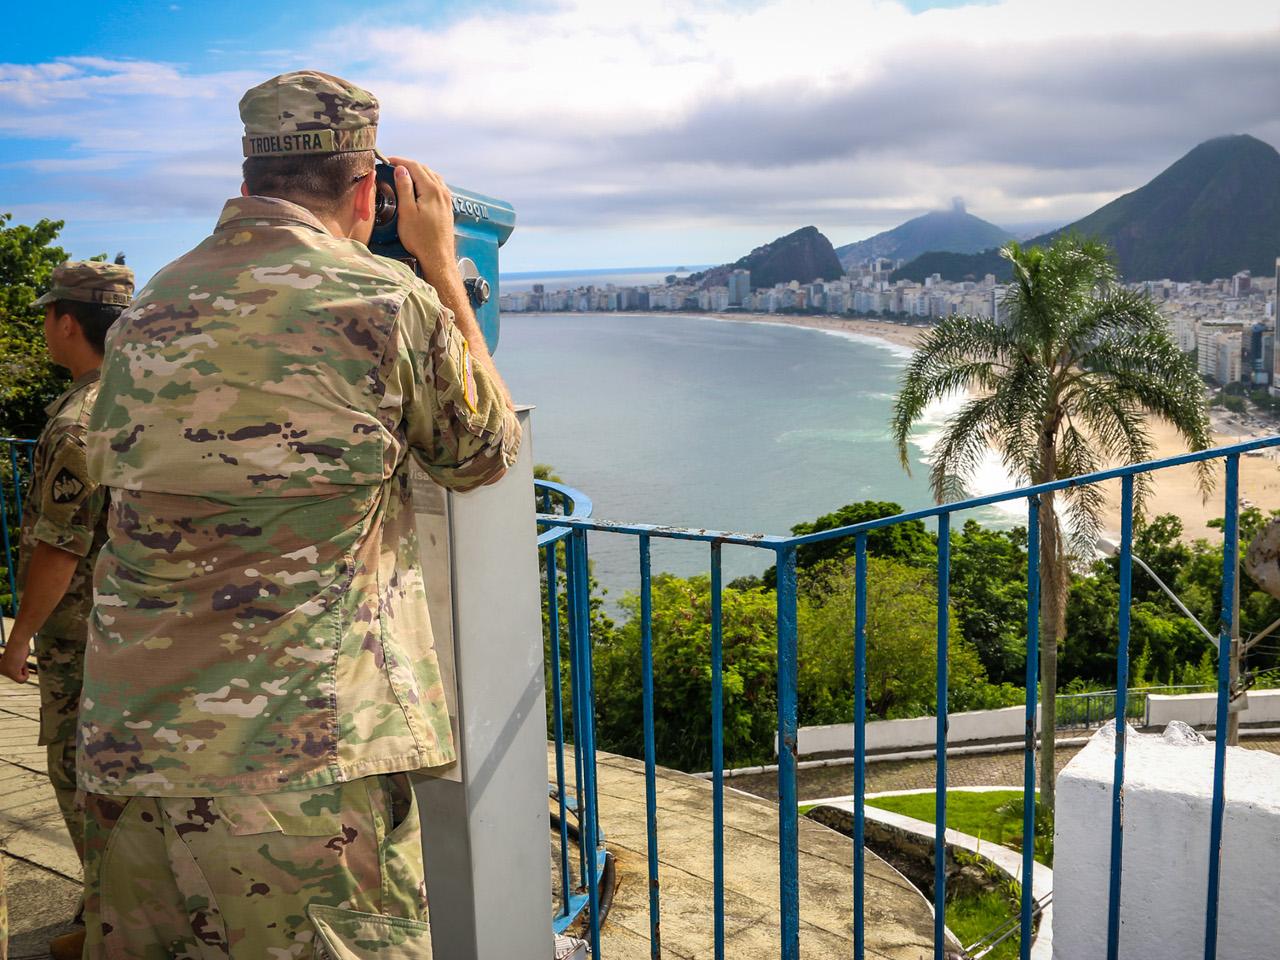 Cadetes de West Point visitam o Forte Duque de Caxias